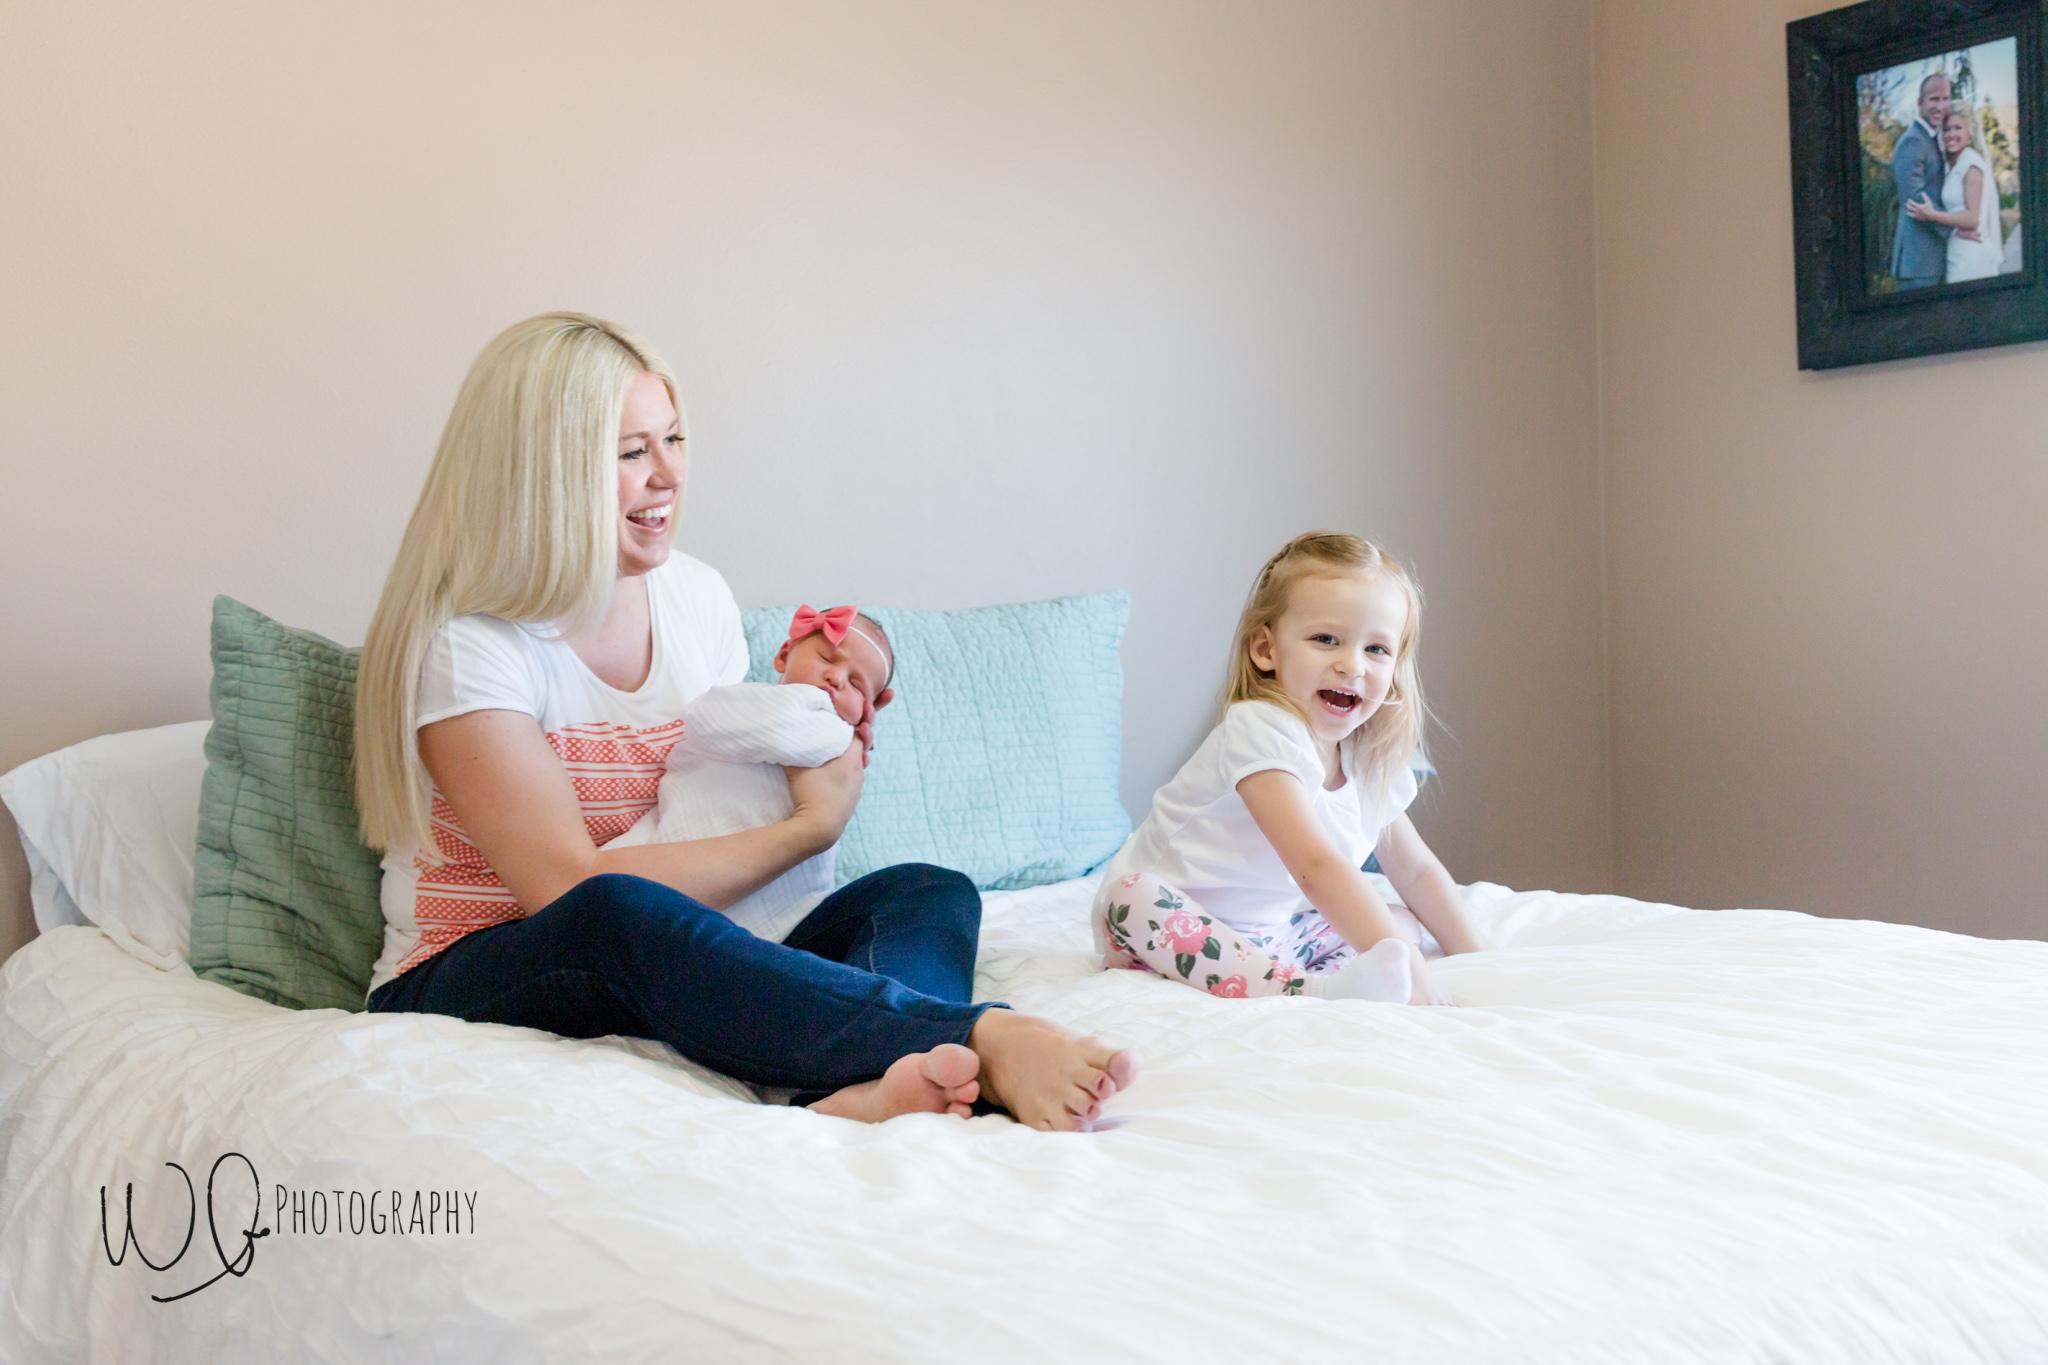 Lifestyle newborns vs posed newborn photos